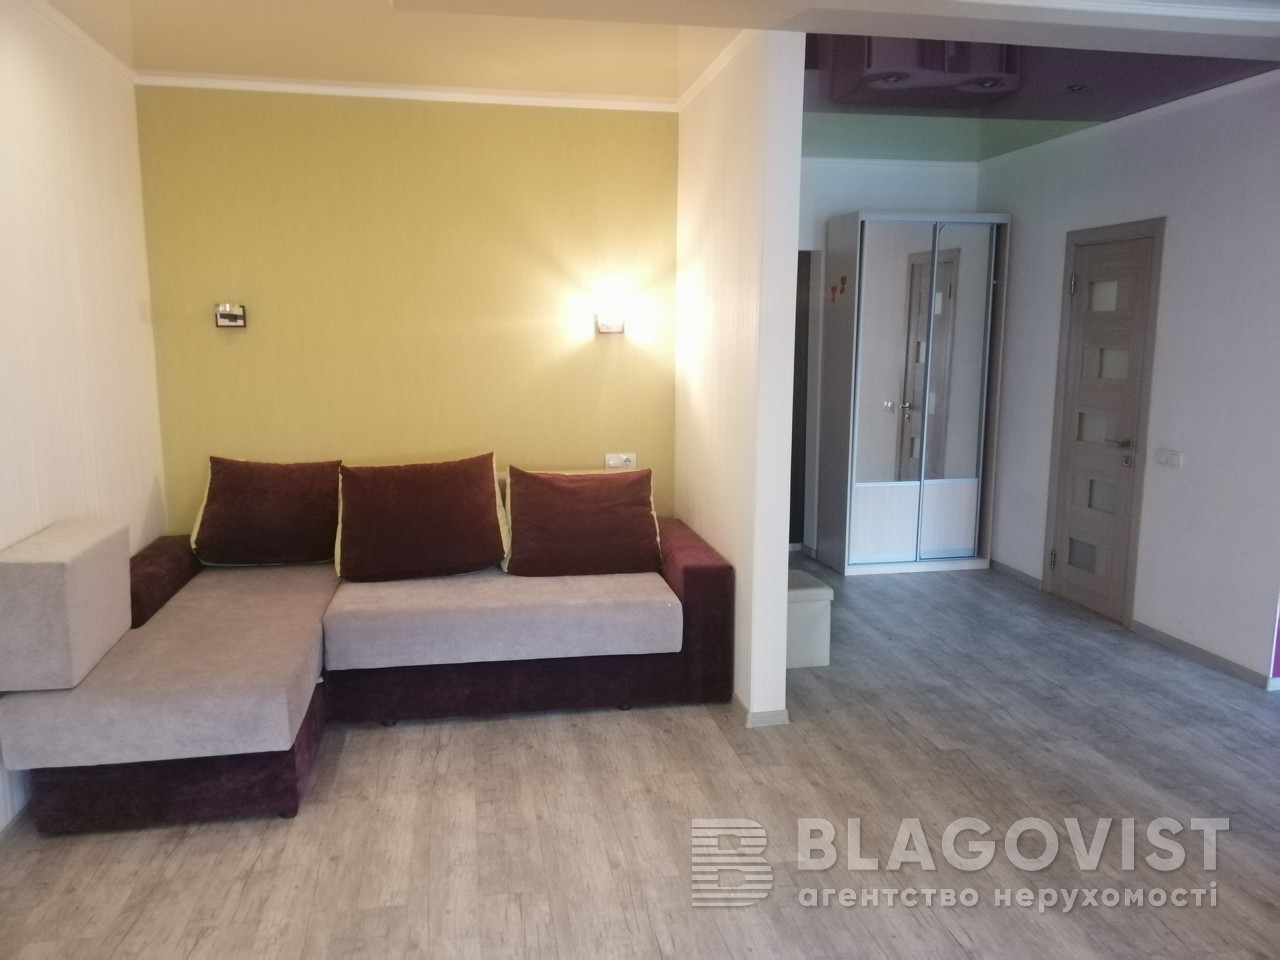 Квартира H-47330, Чавдар Елизаветы, 5, Киев - Фото 1